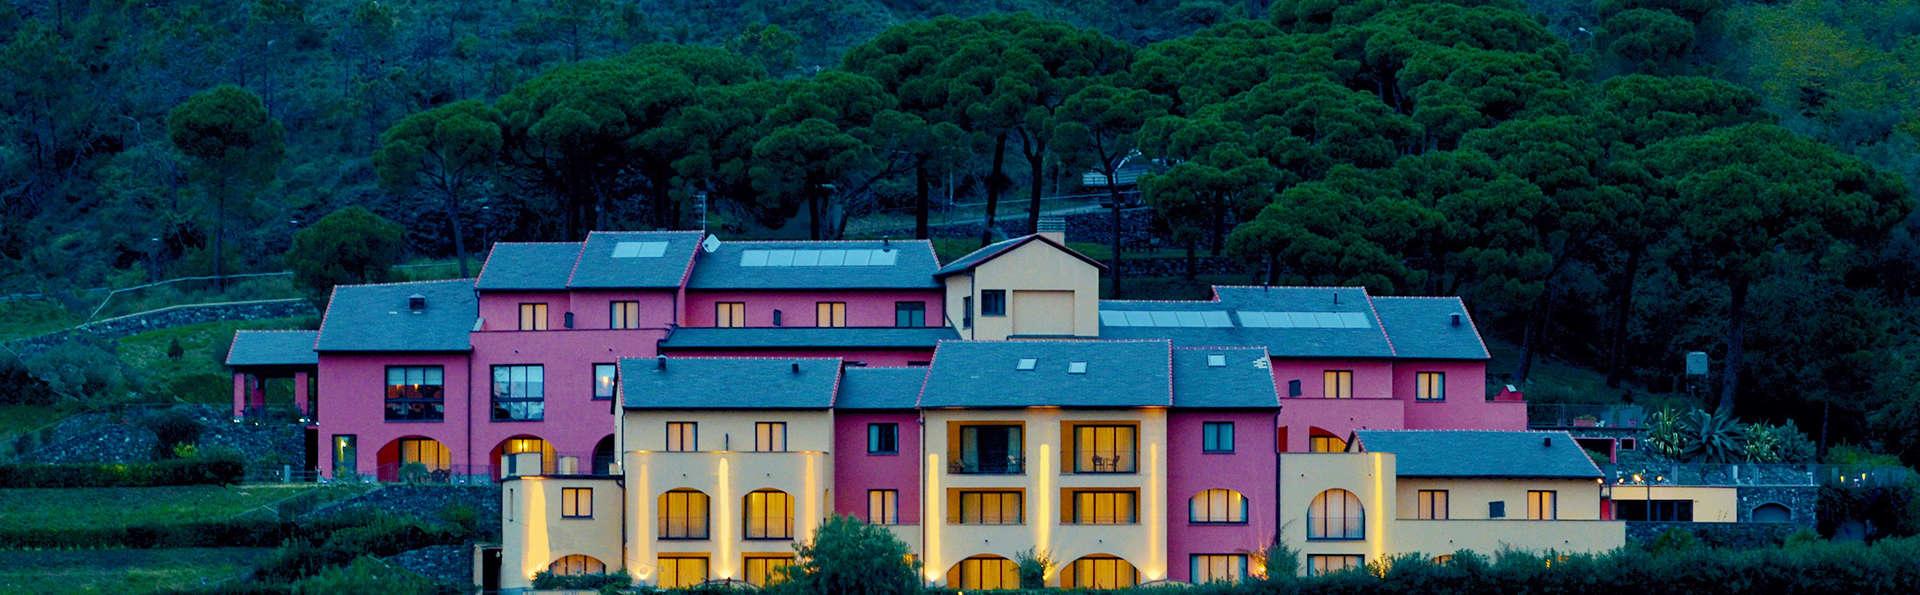 Park Hotel Argento - EDIT-front.jpg